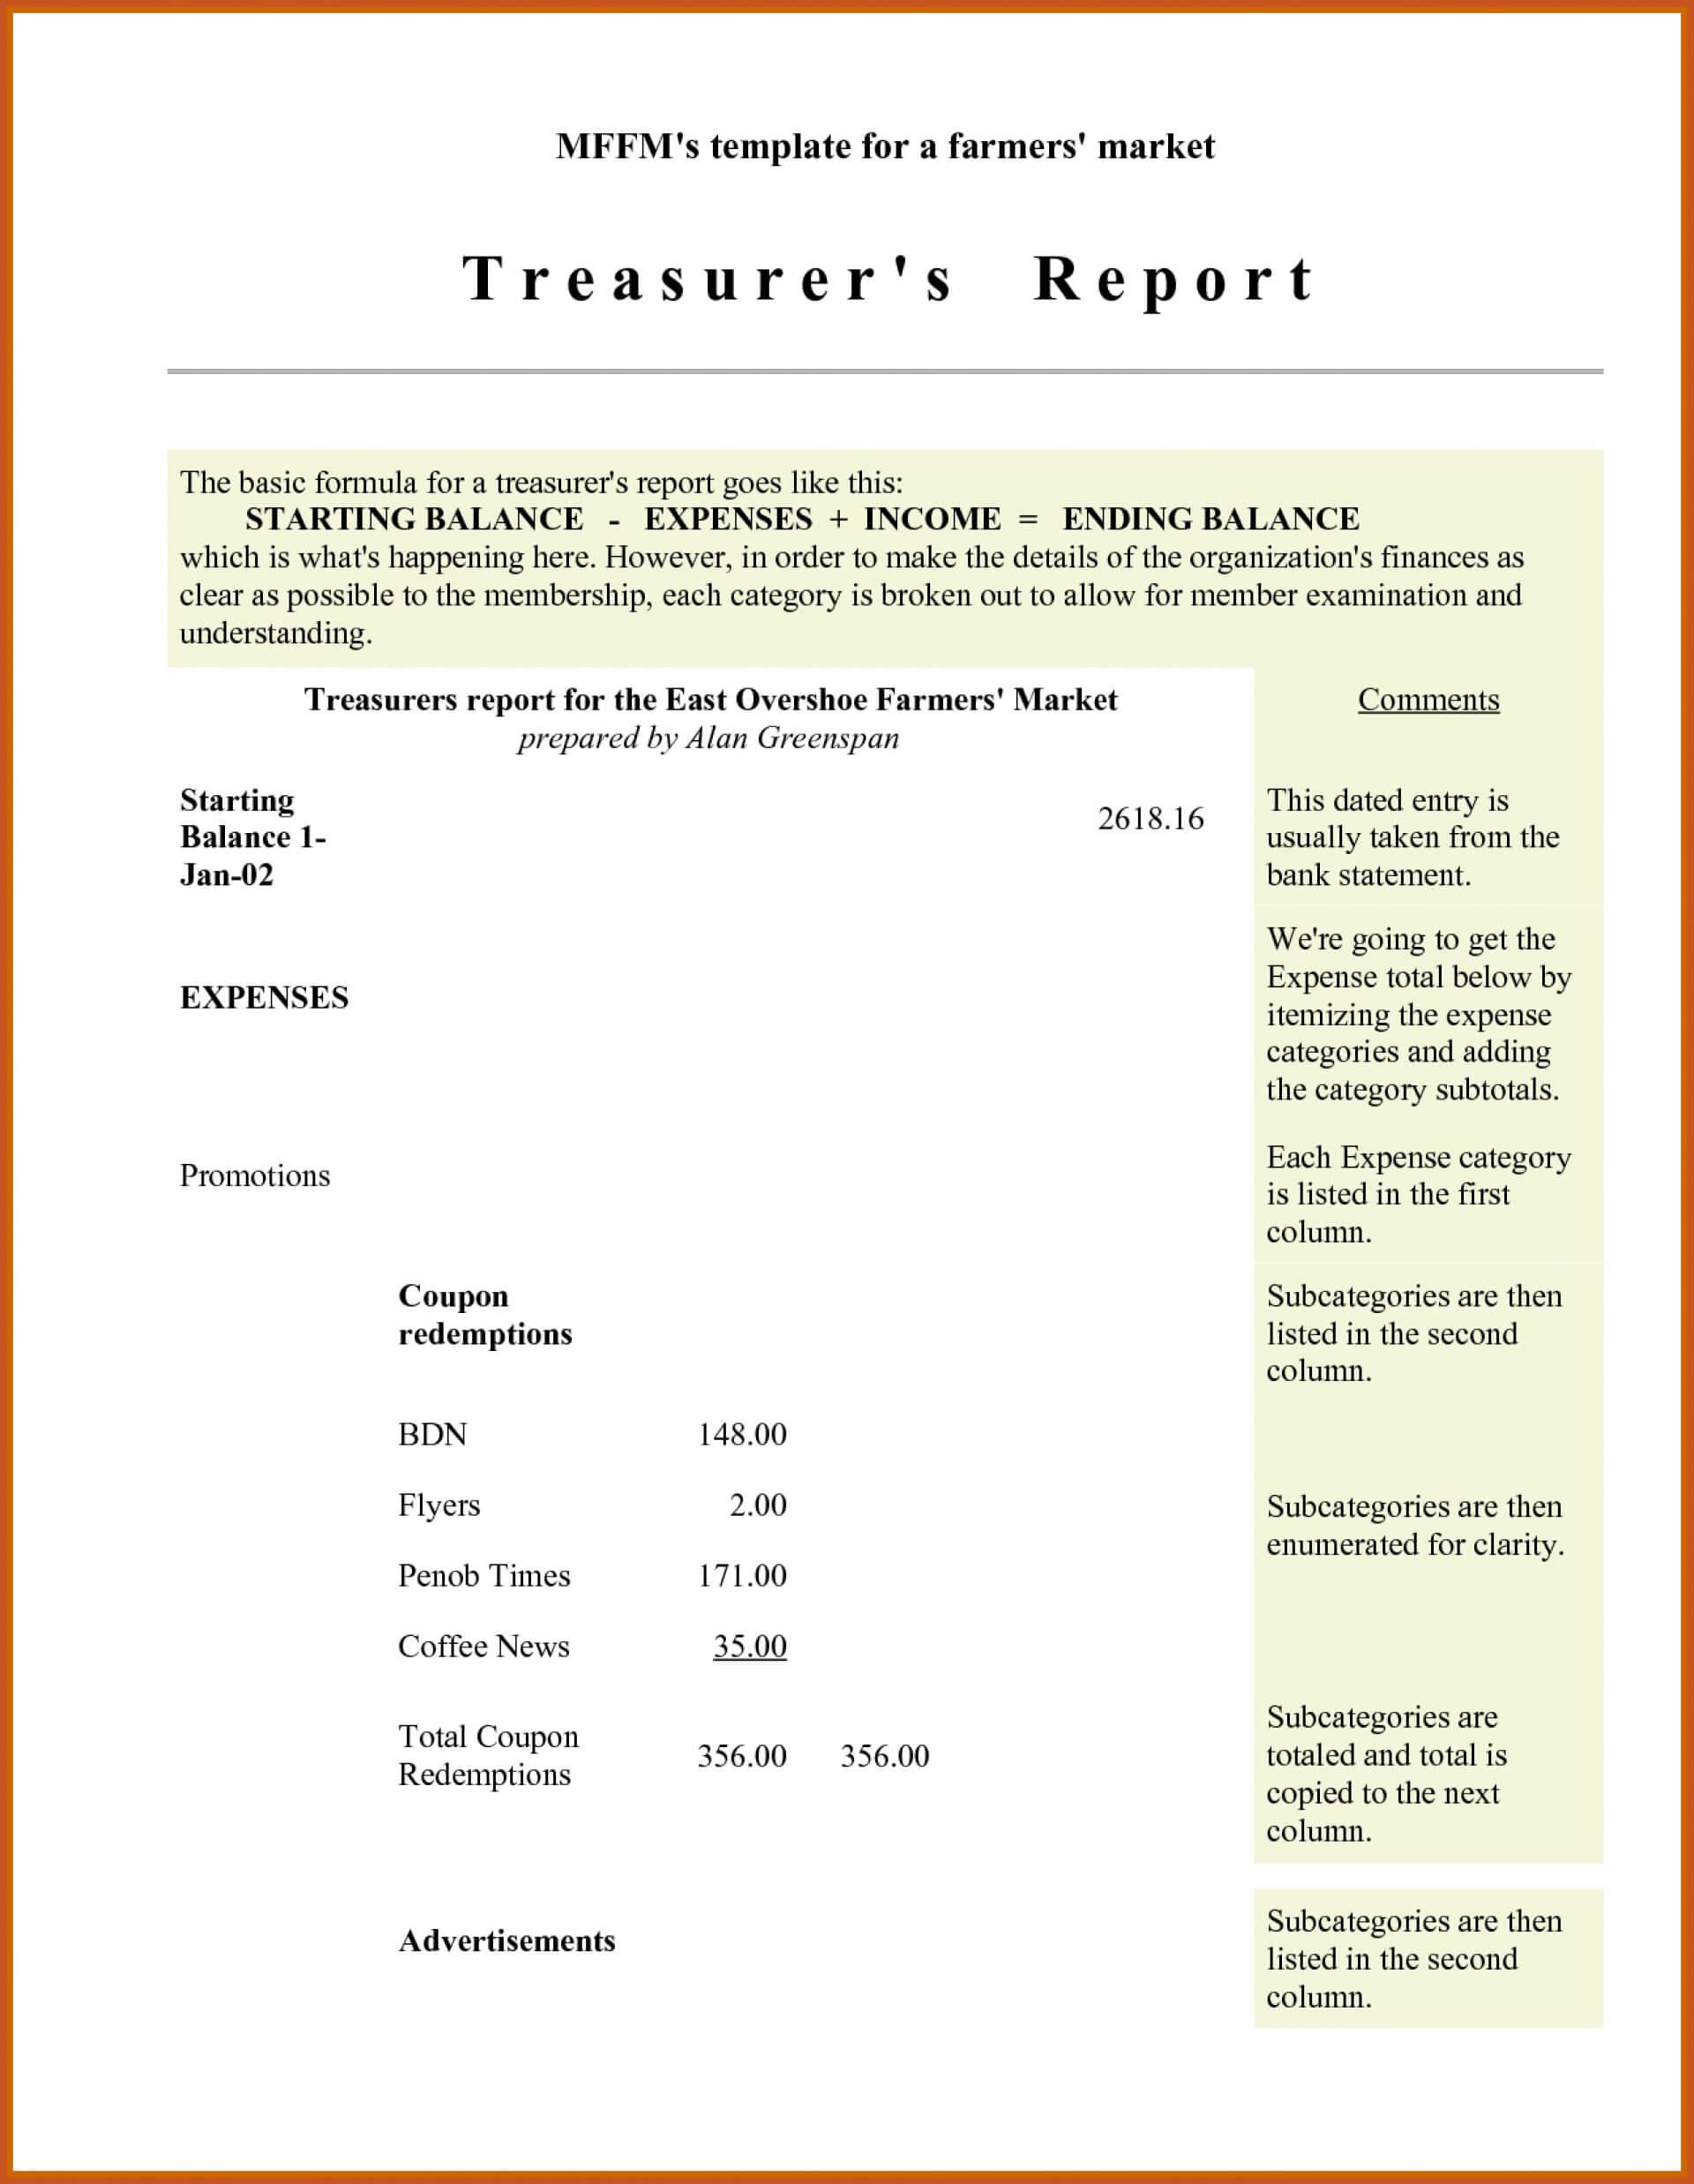 003 Treasurer Report Template Non Profit Sample Treasurers For Treasurer Report Template Non Profit